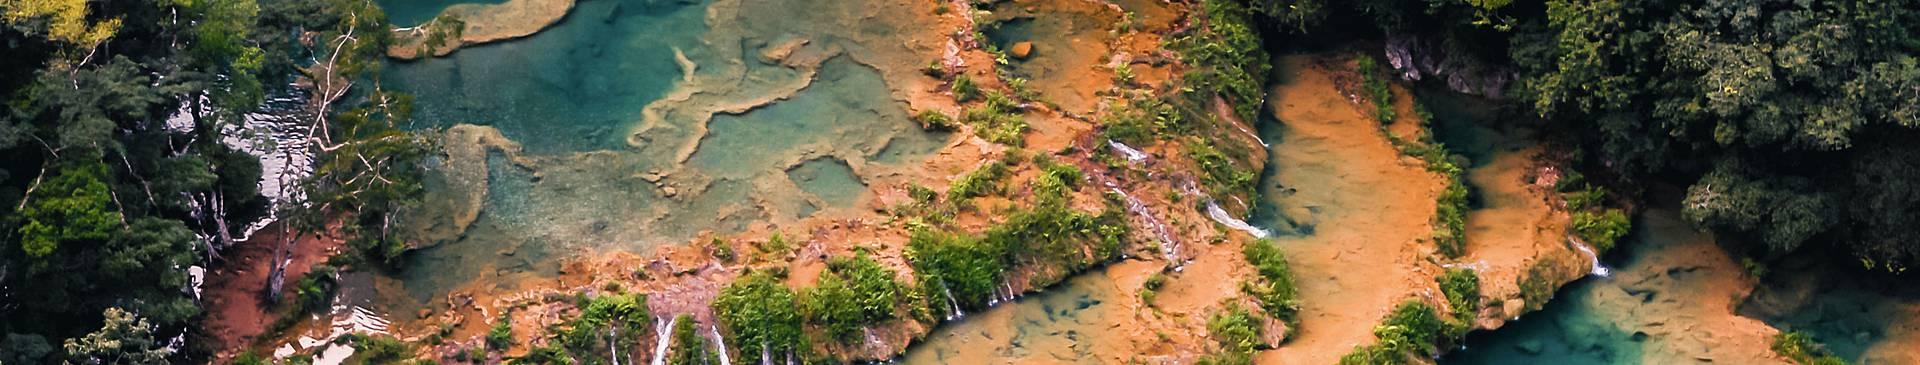 Nature in Guatemala